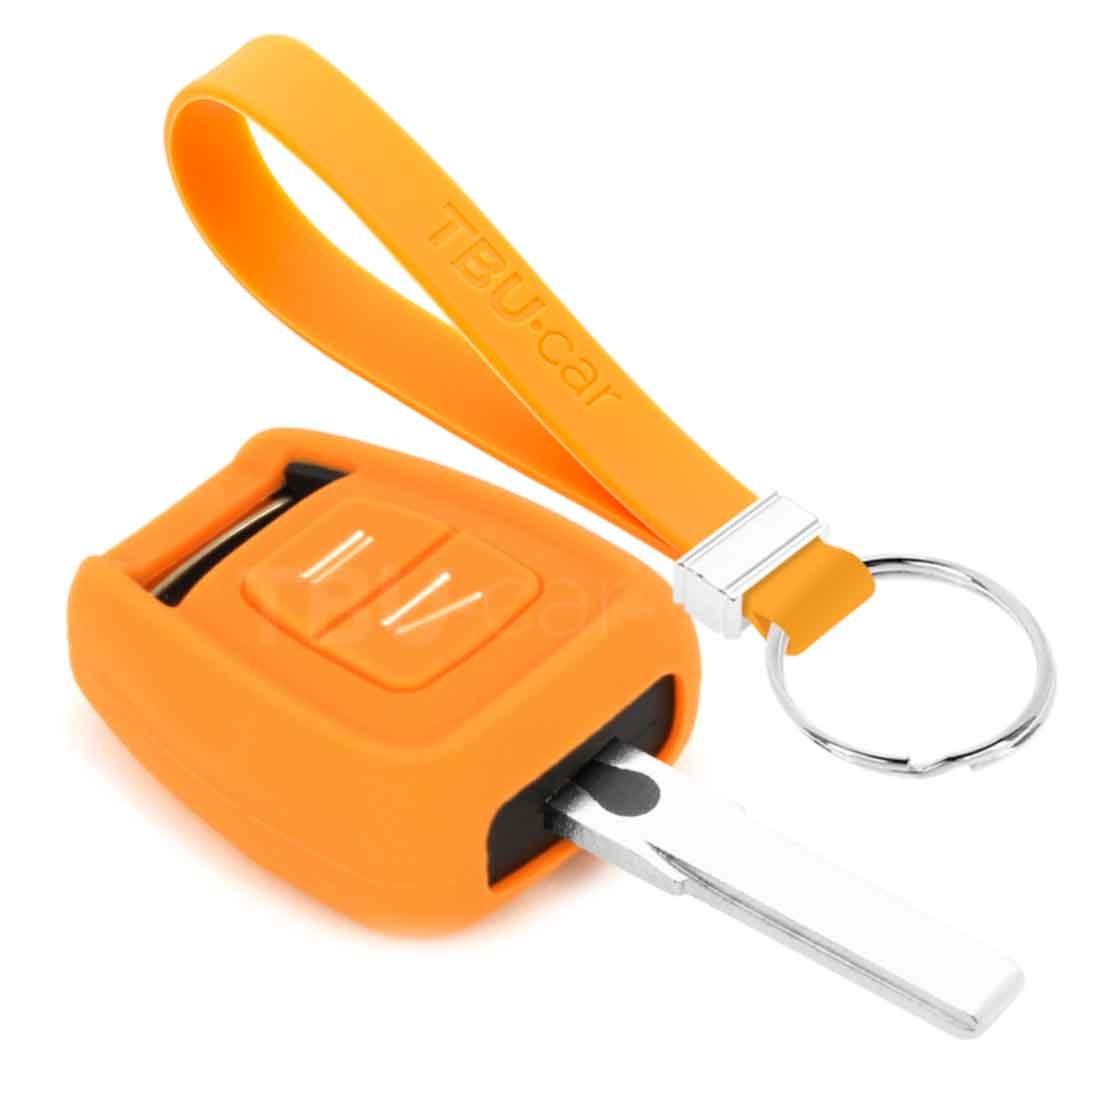 TBU car TBU car Sleutel cover compatibel met Vauxhall - Silicone sleutelhoesje - beschermhoesje autosleutel - Oranje